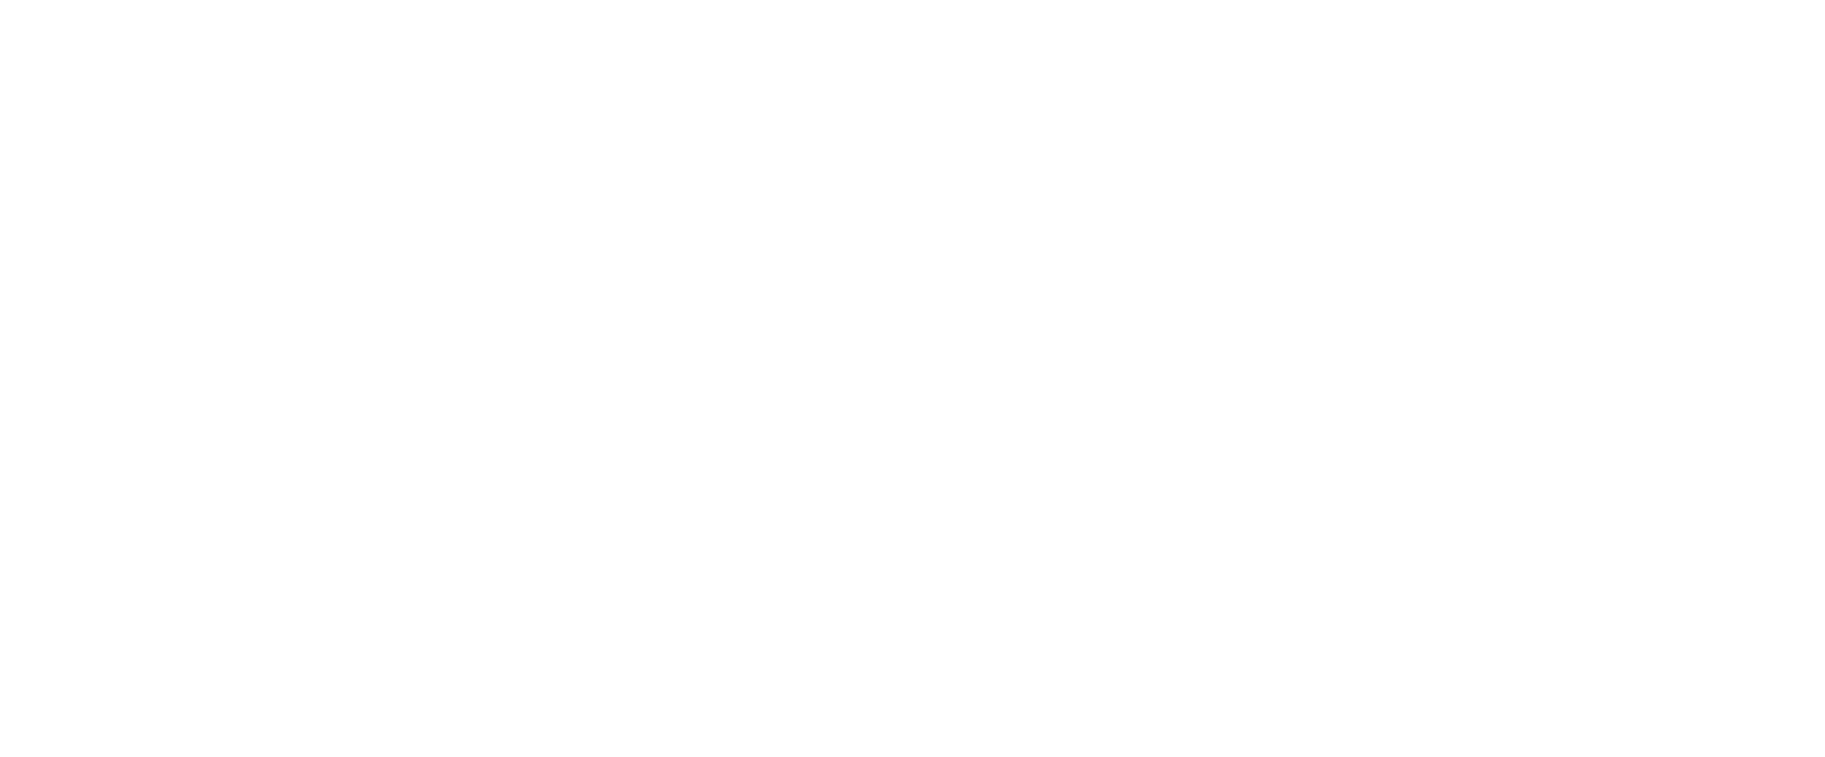 Venn diagram of services